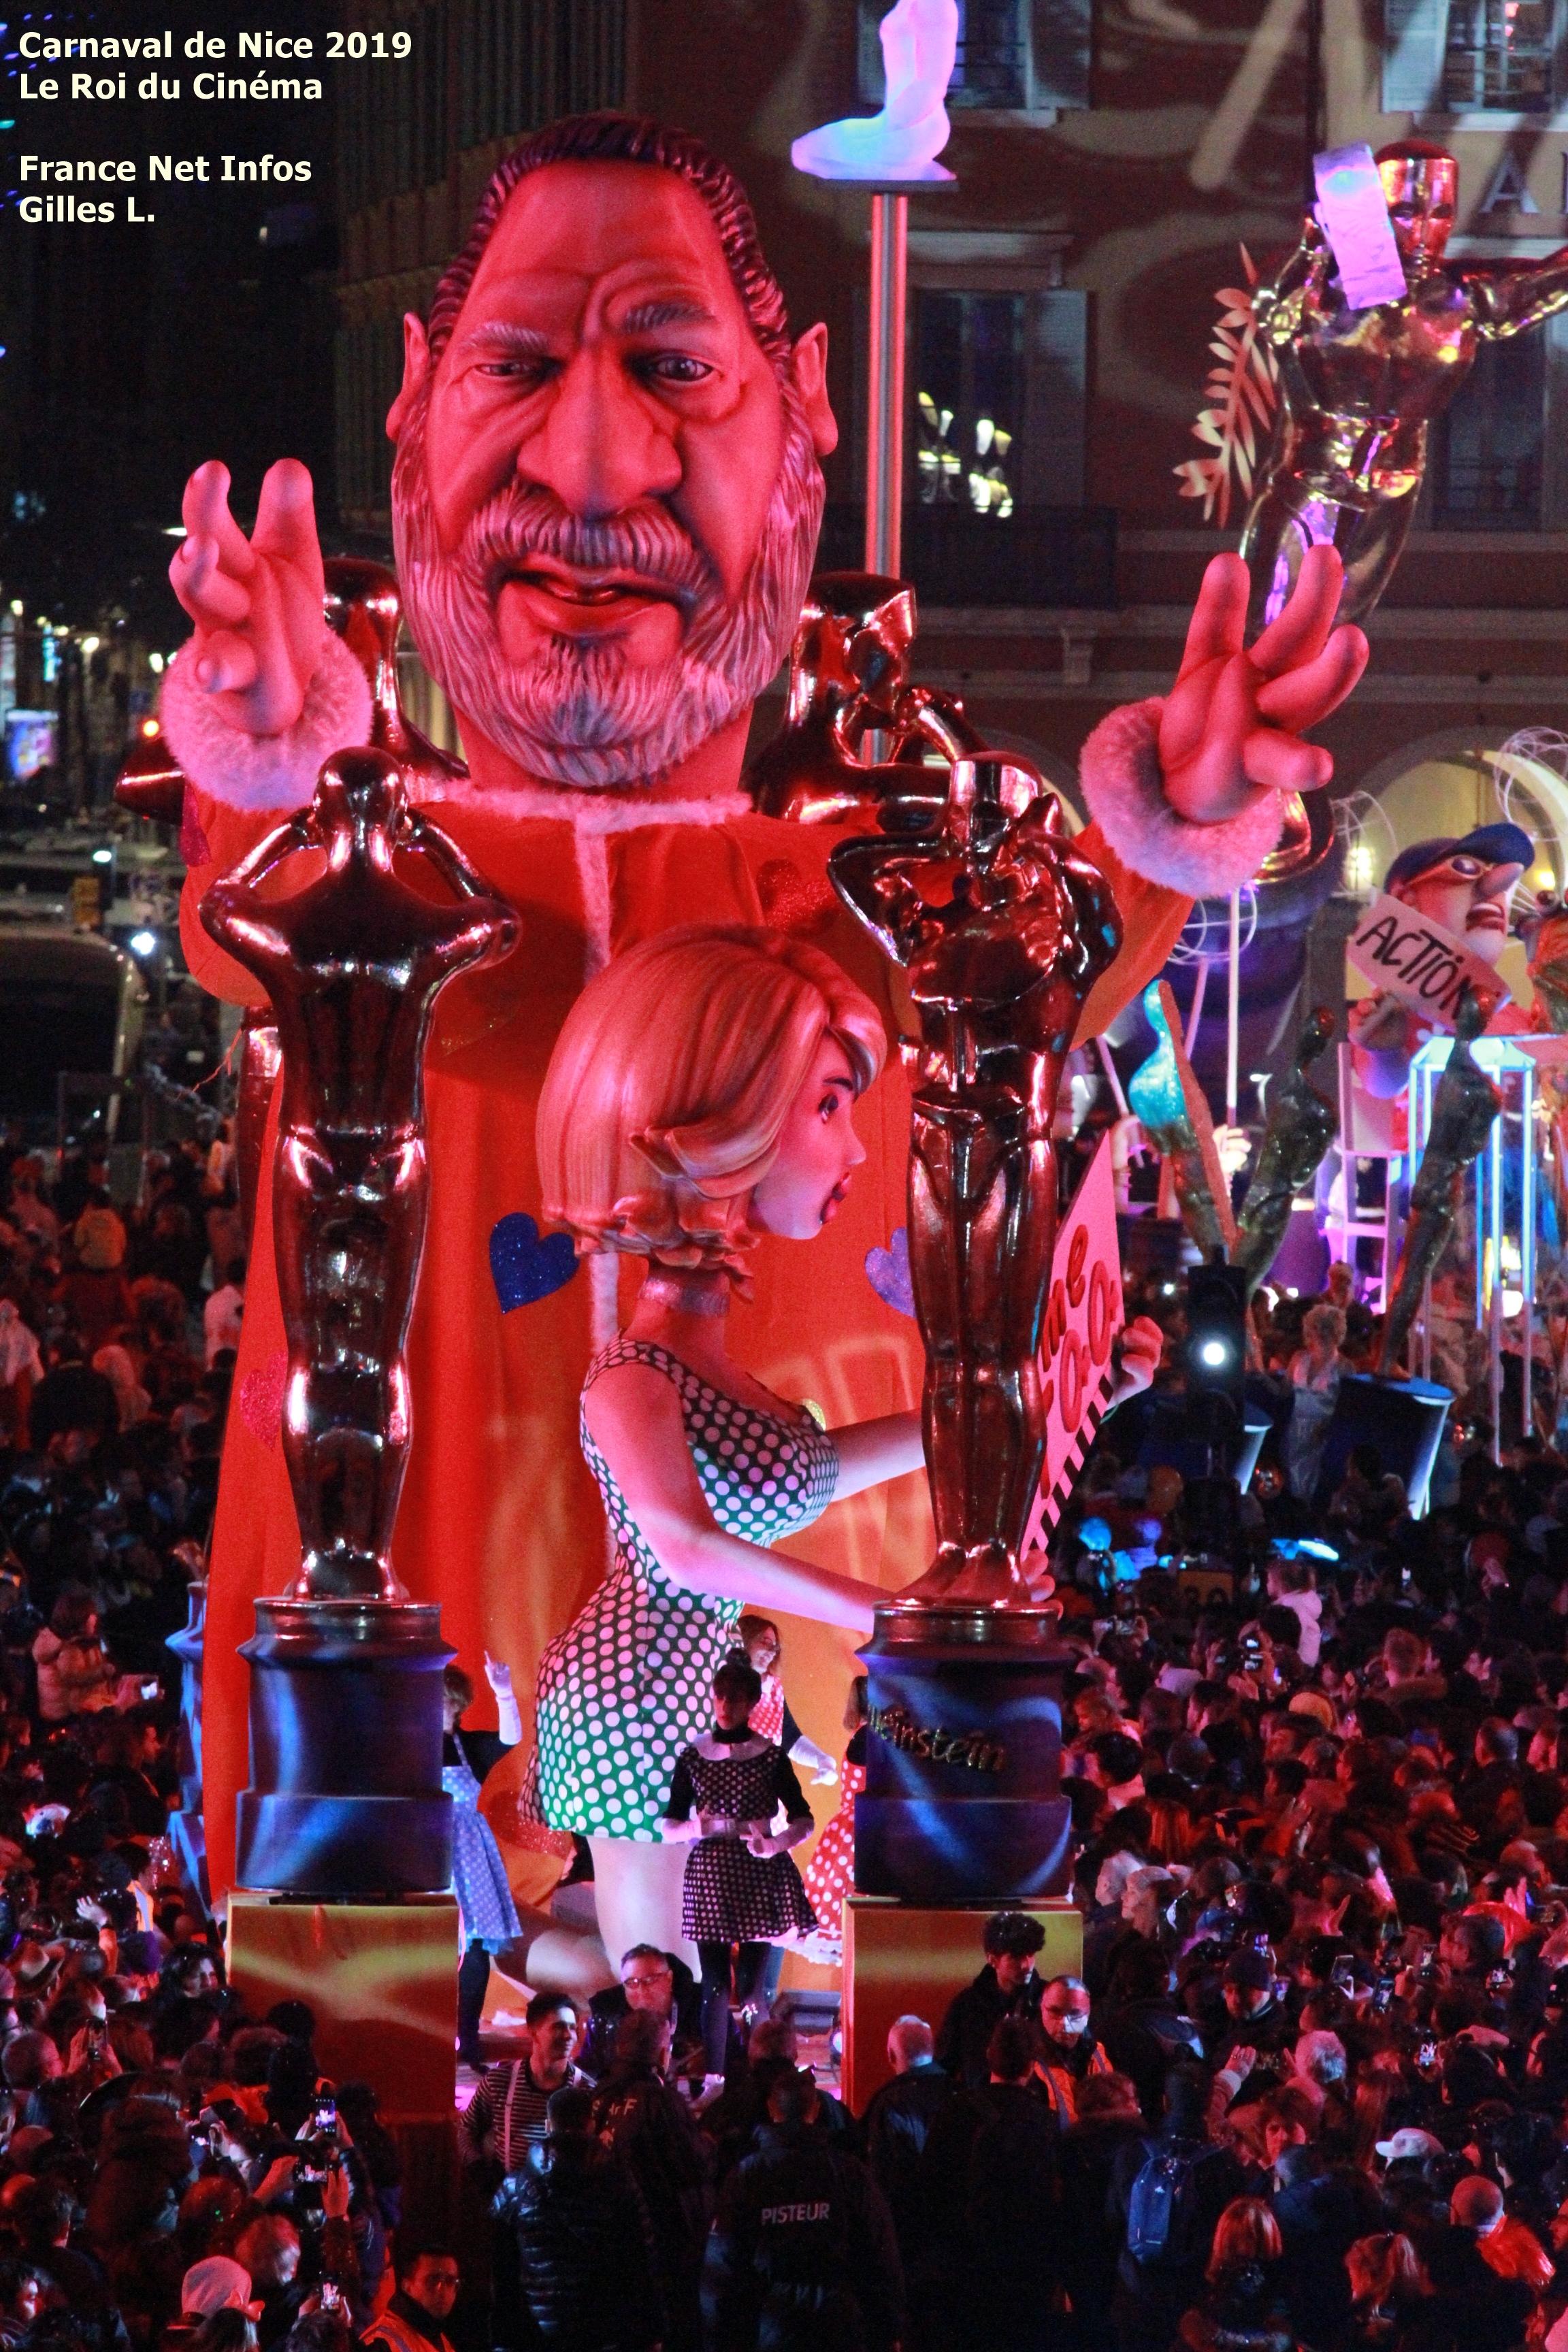 Carnaval Nice 2019.jpeg0696